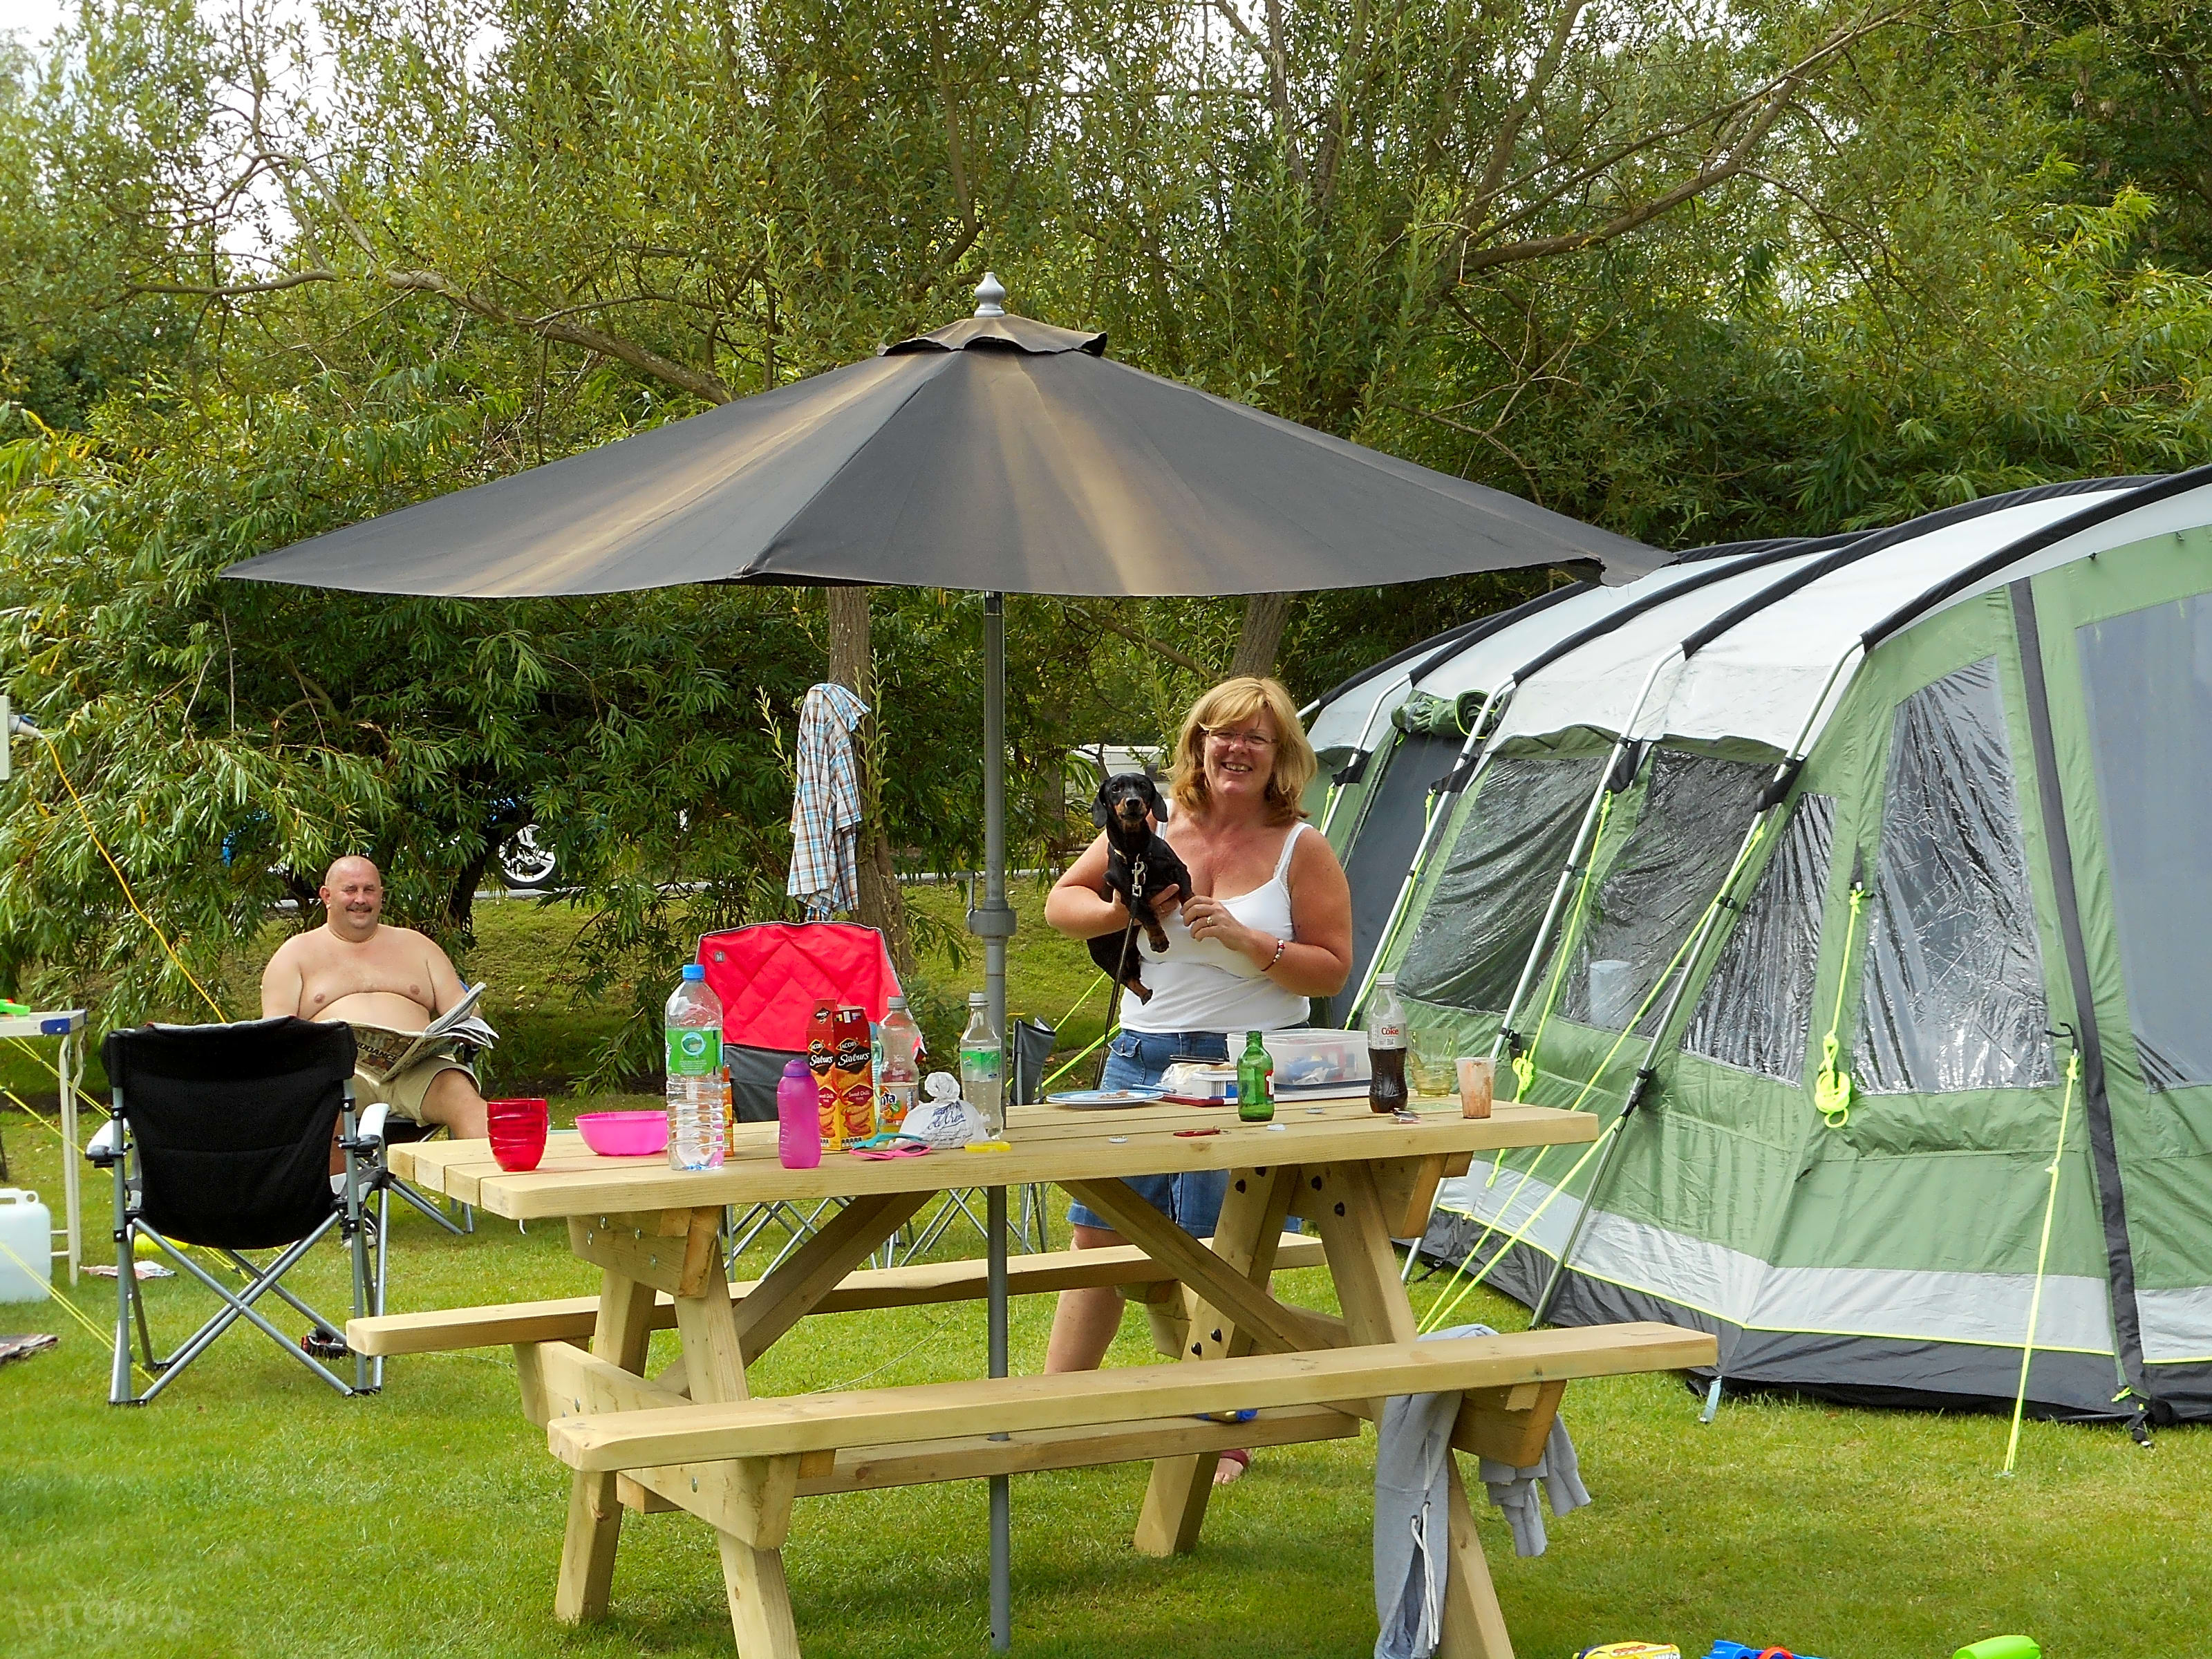 Lickhill Manor Caravan Park, Stourport-on-Severn - Updated